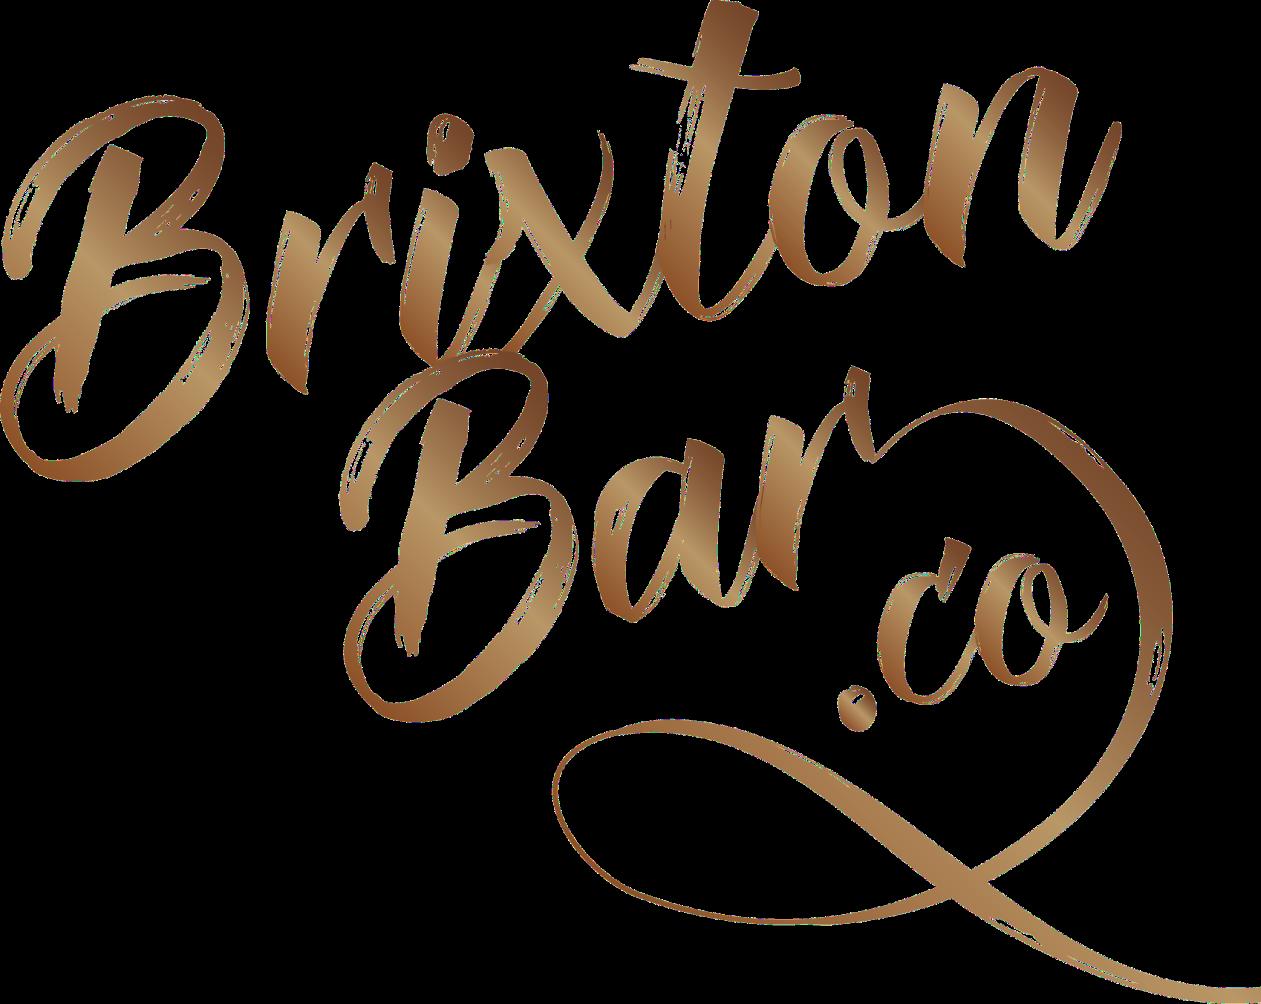 BRIXTON BAR